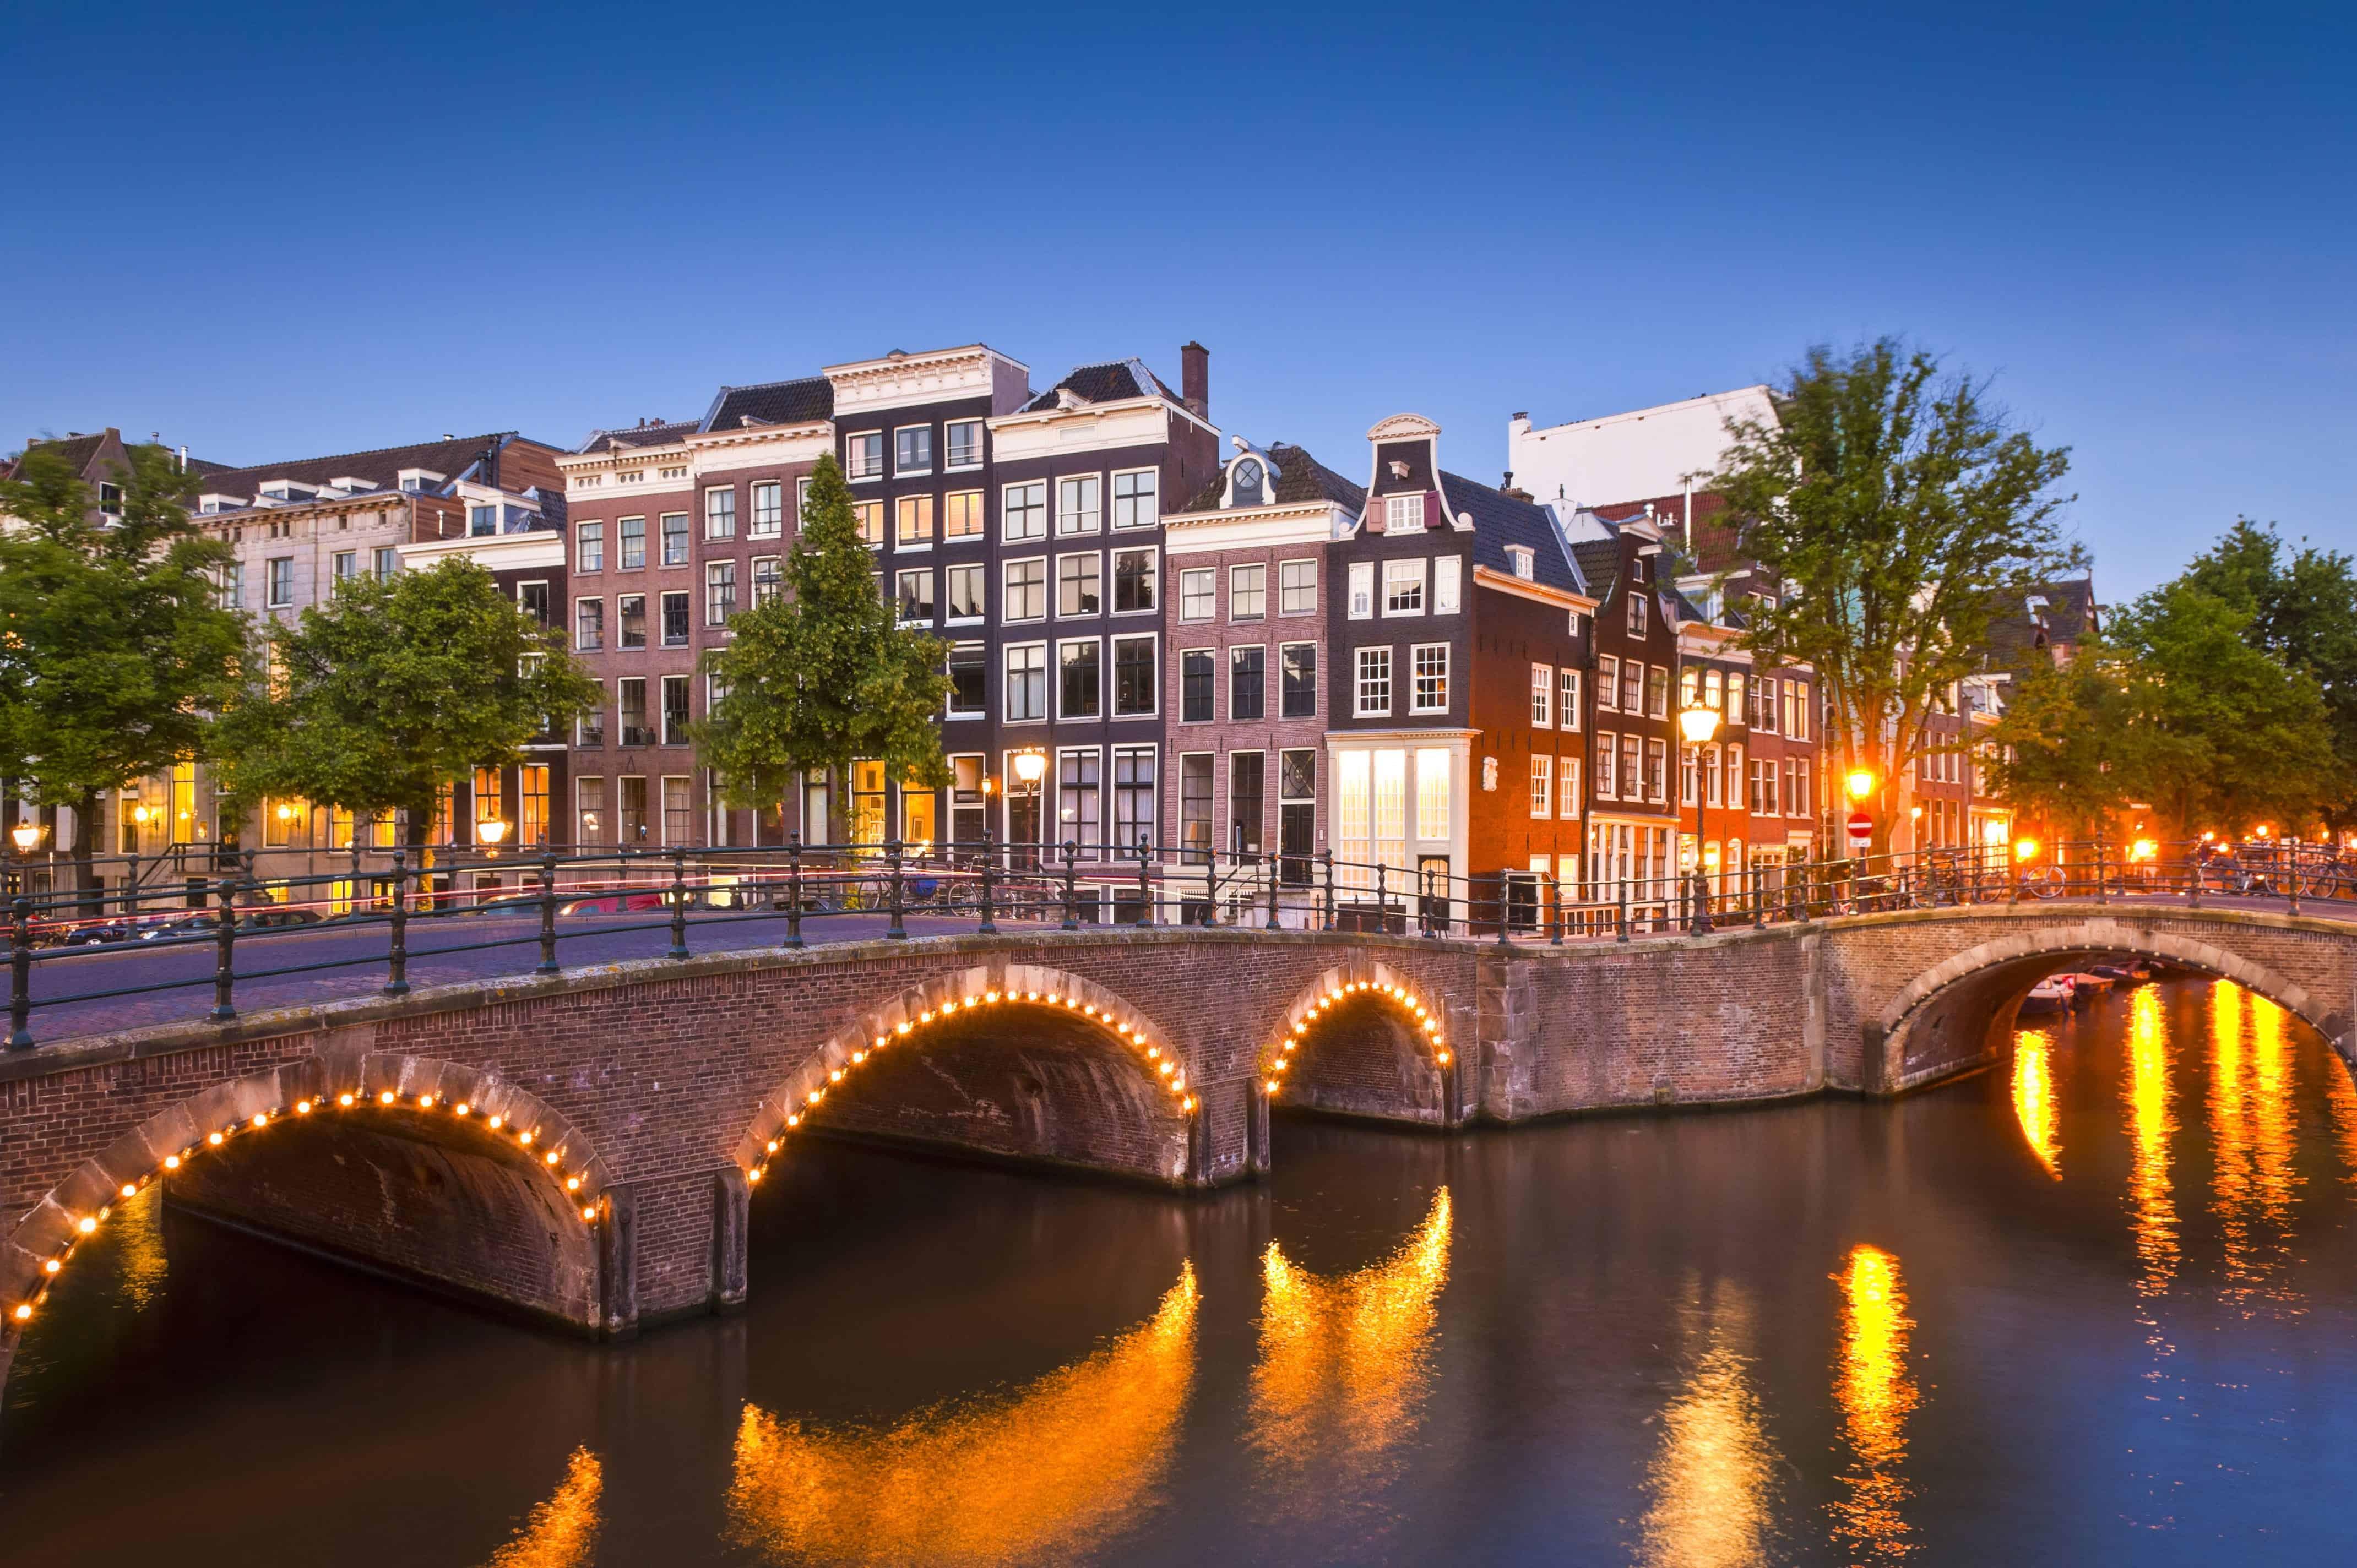 Lokaal advies over Amsterdam